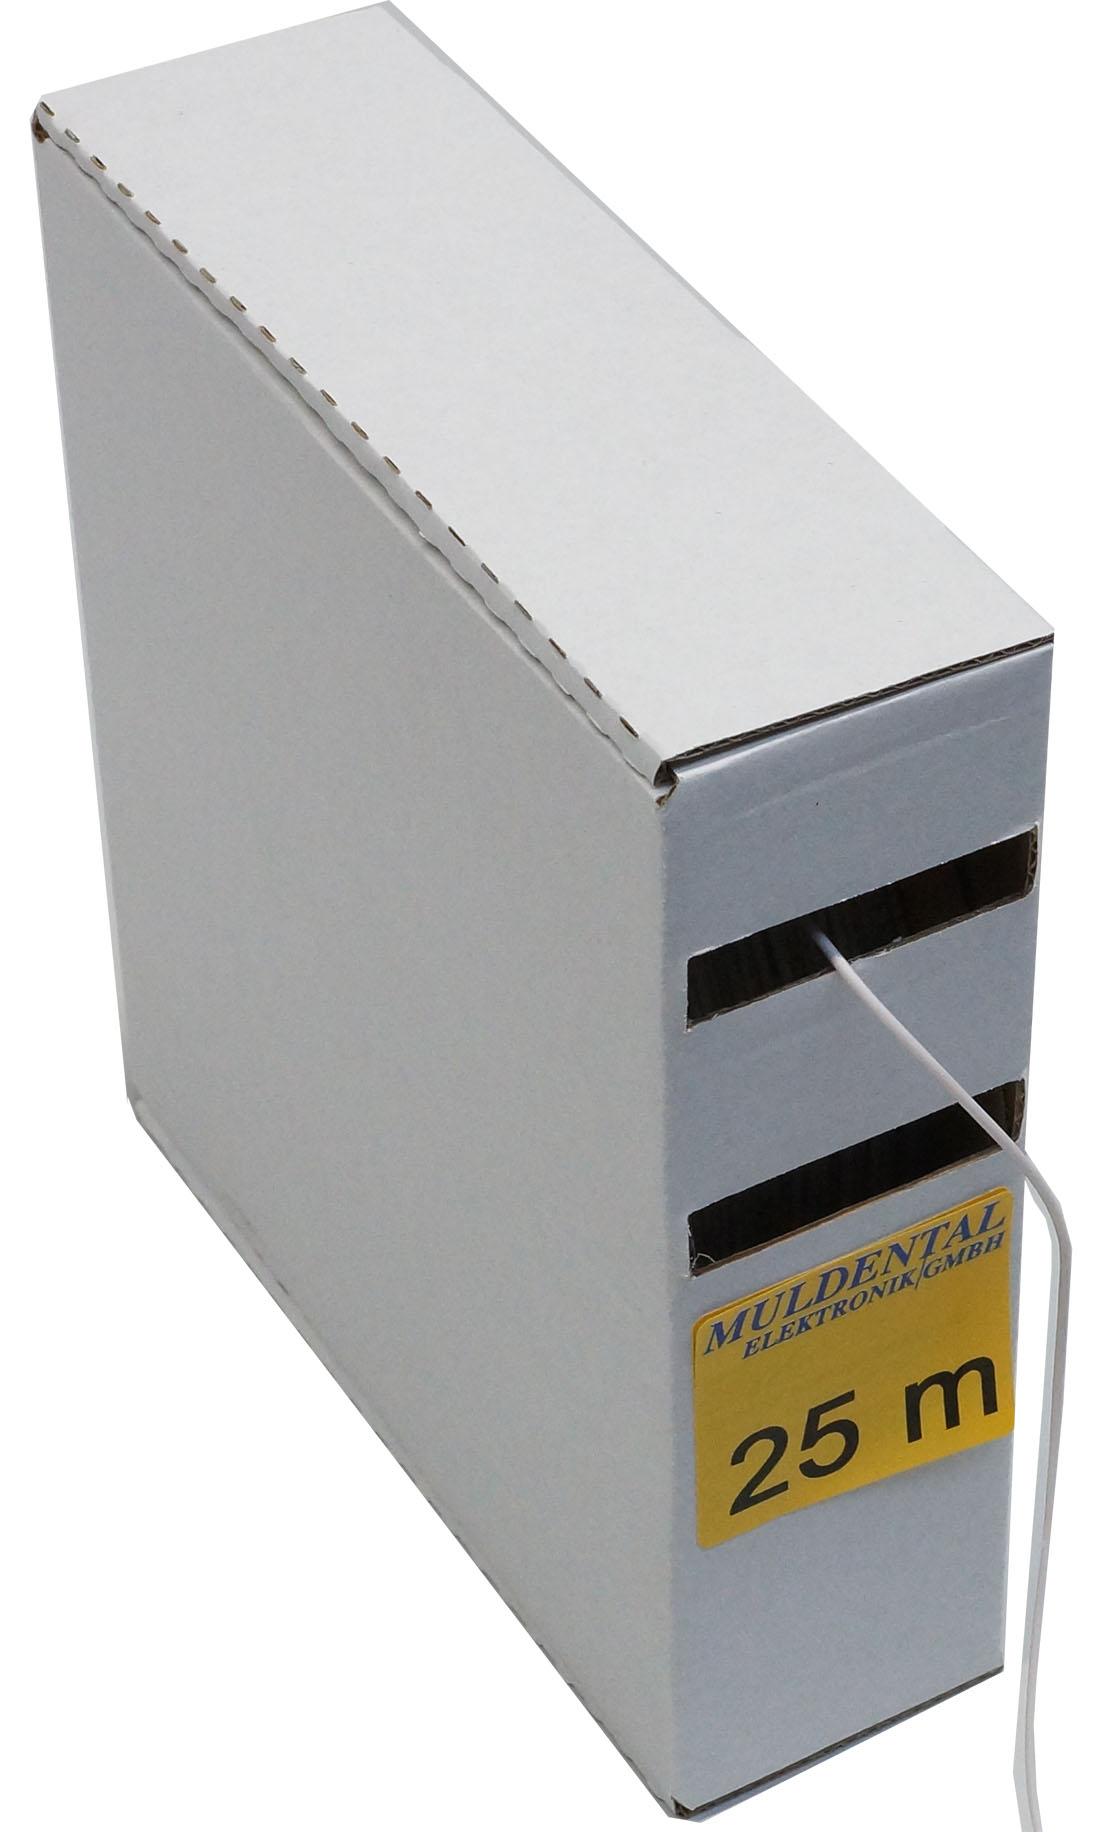 Silikonlitze, verpackt-Muldental Elektronik GmbH